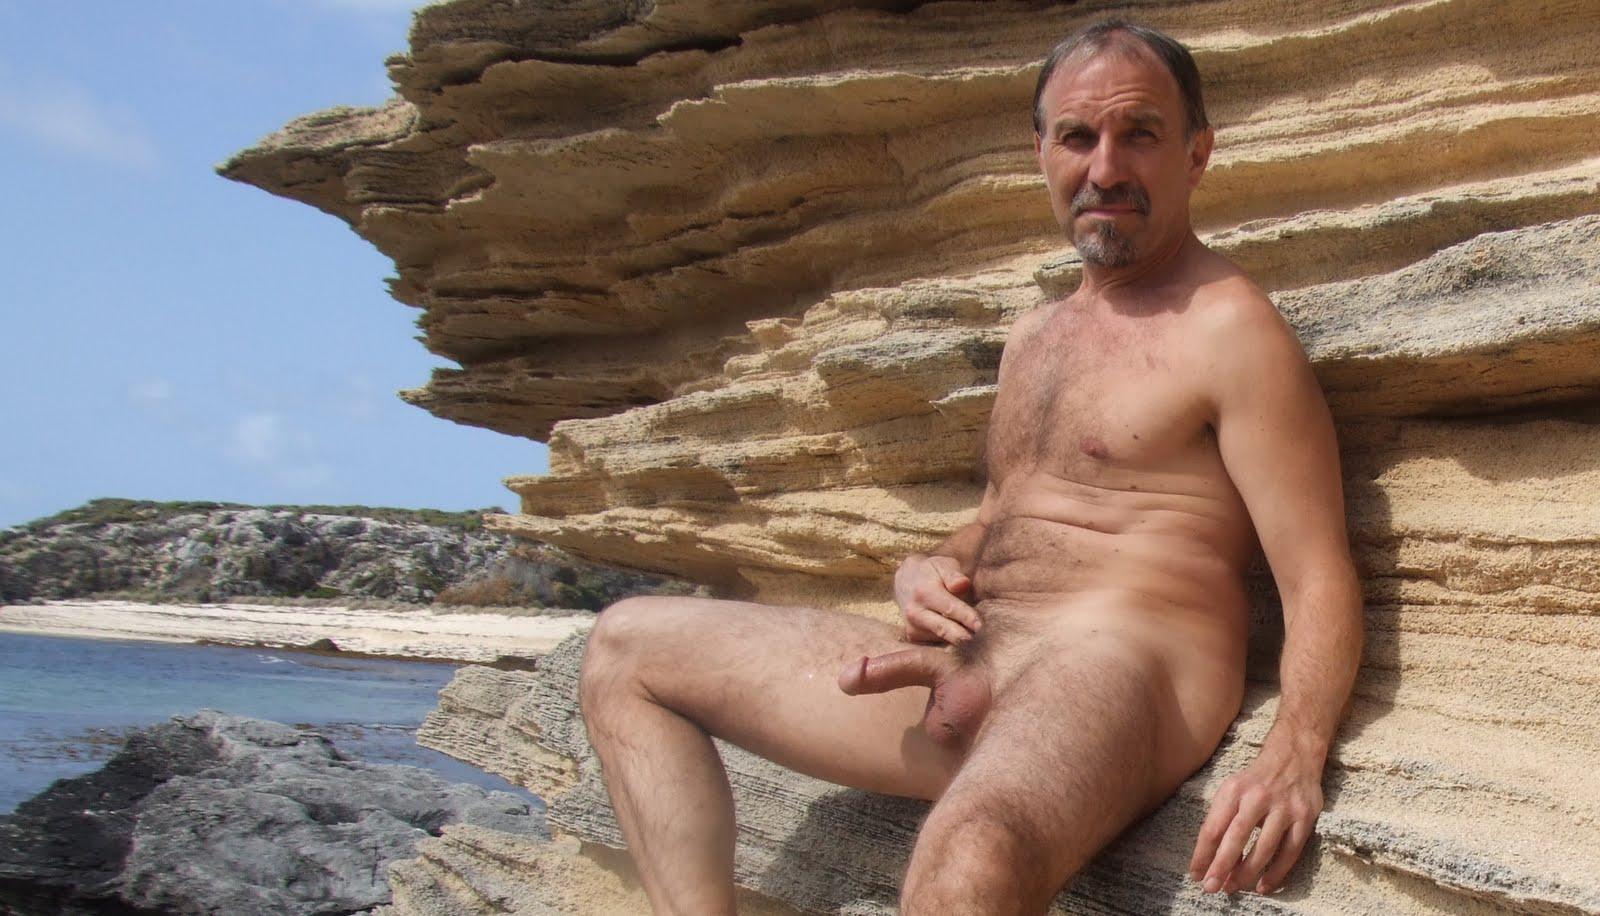 Nude men with big dicks